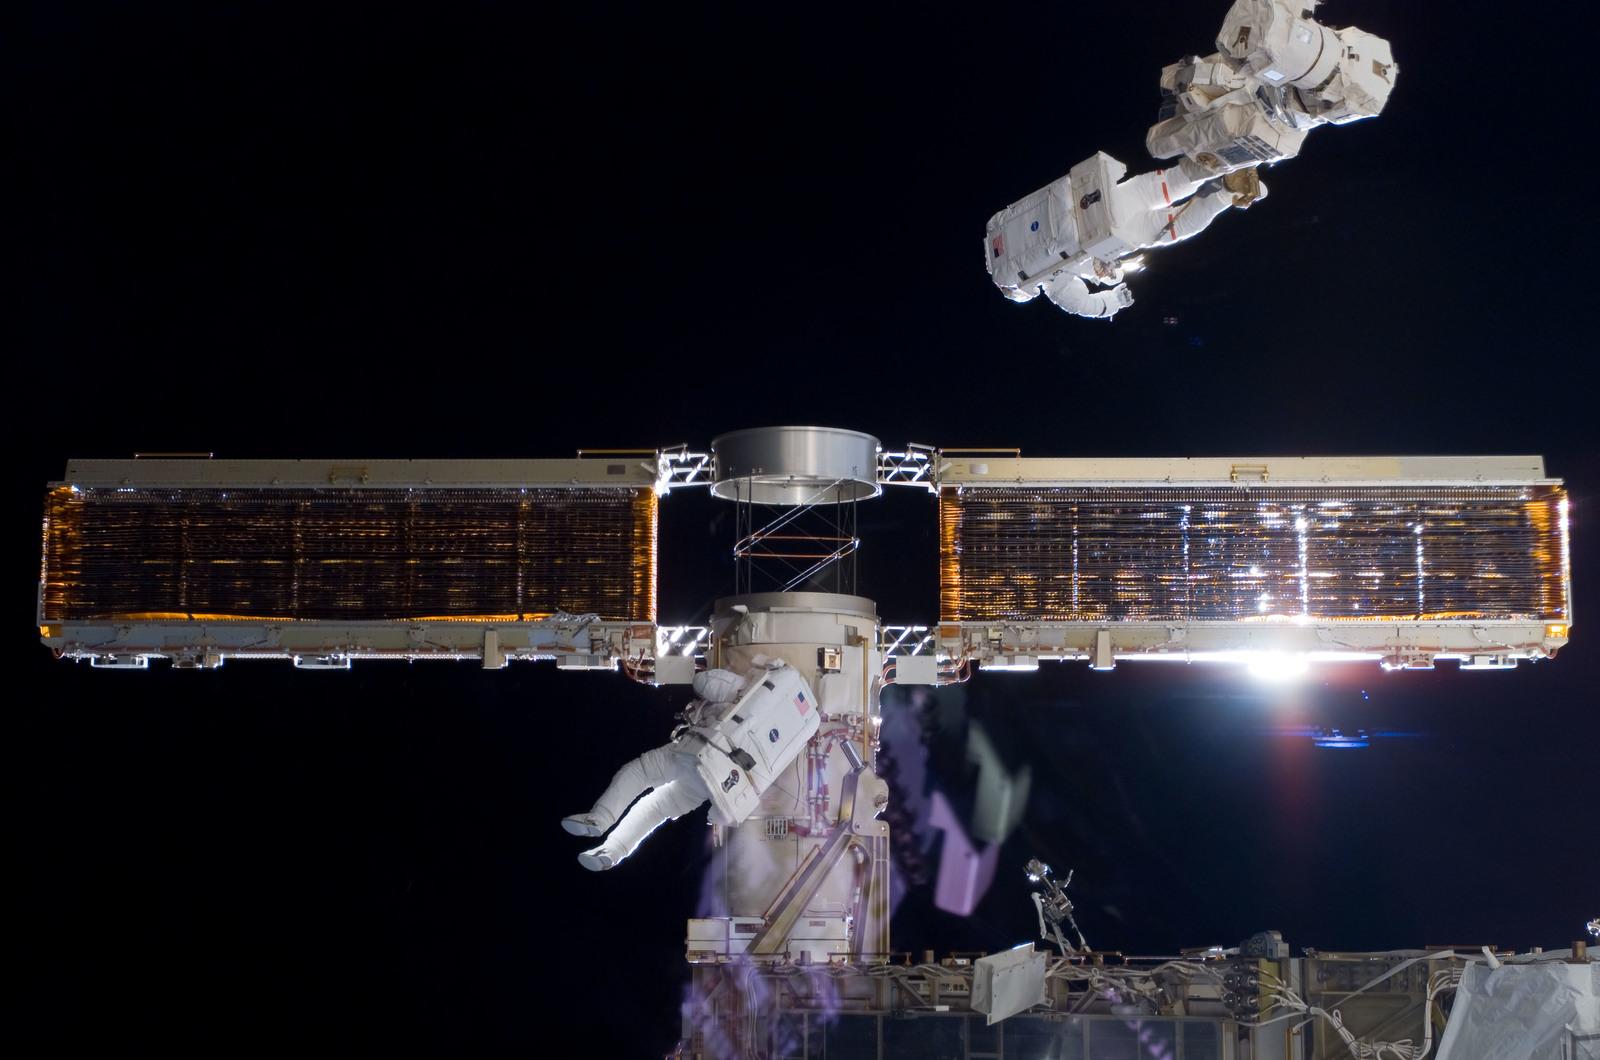 S116E06858 - STS-116 - STS-116 MS Fuglesang and Curbeam,Jr.,during EVA 4